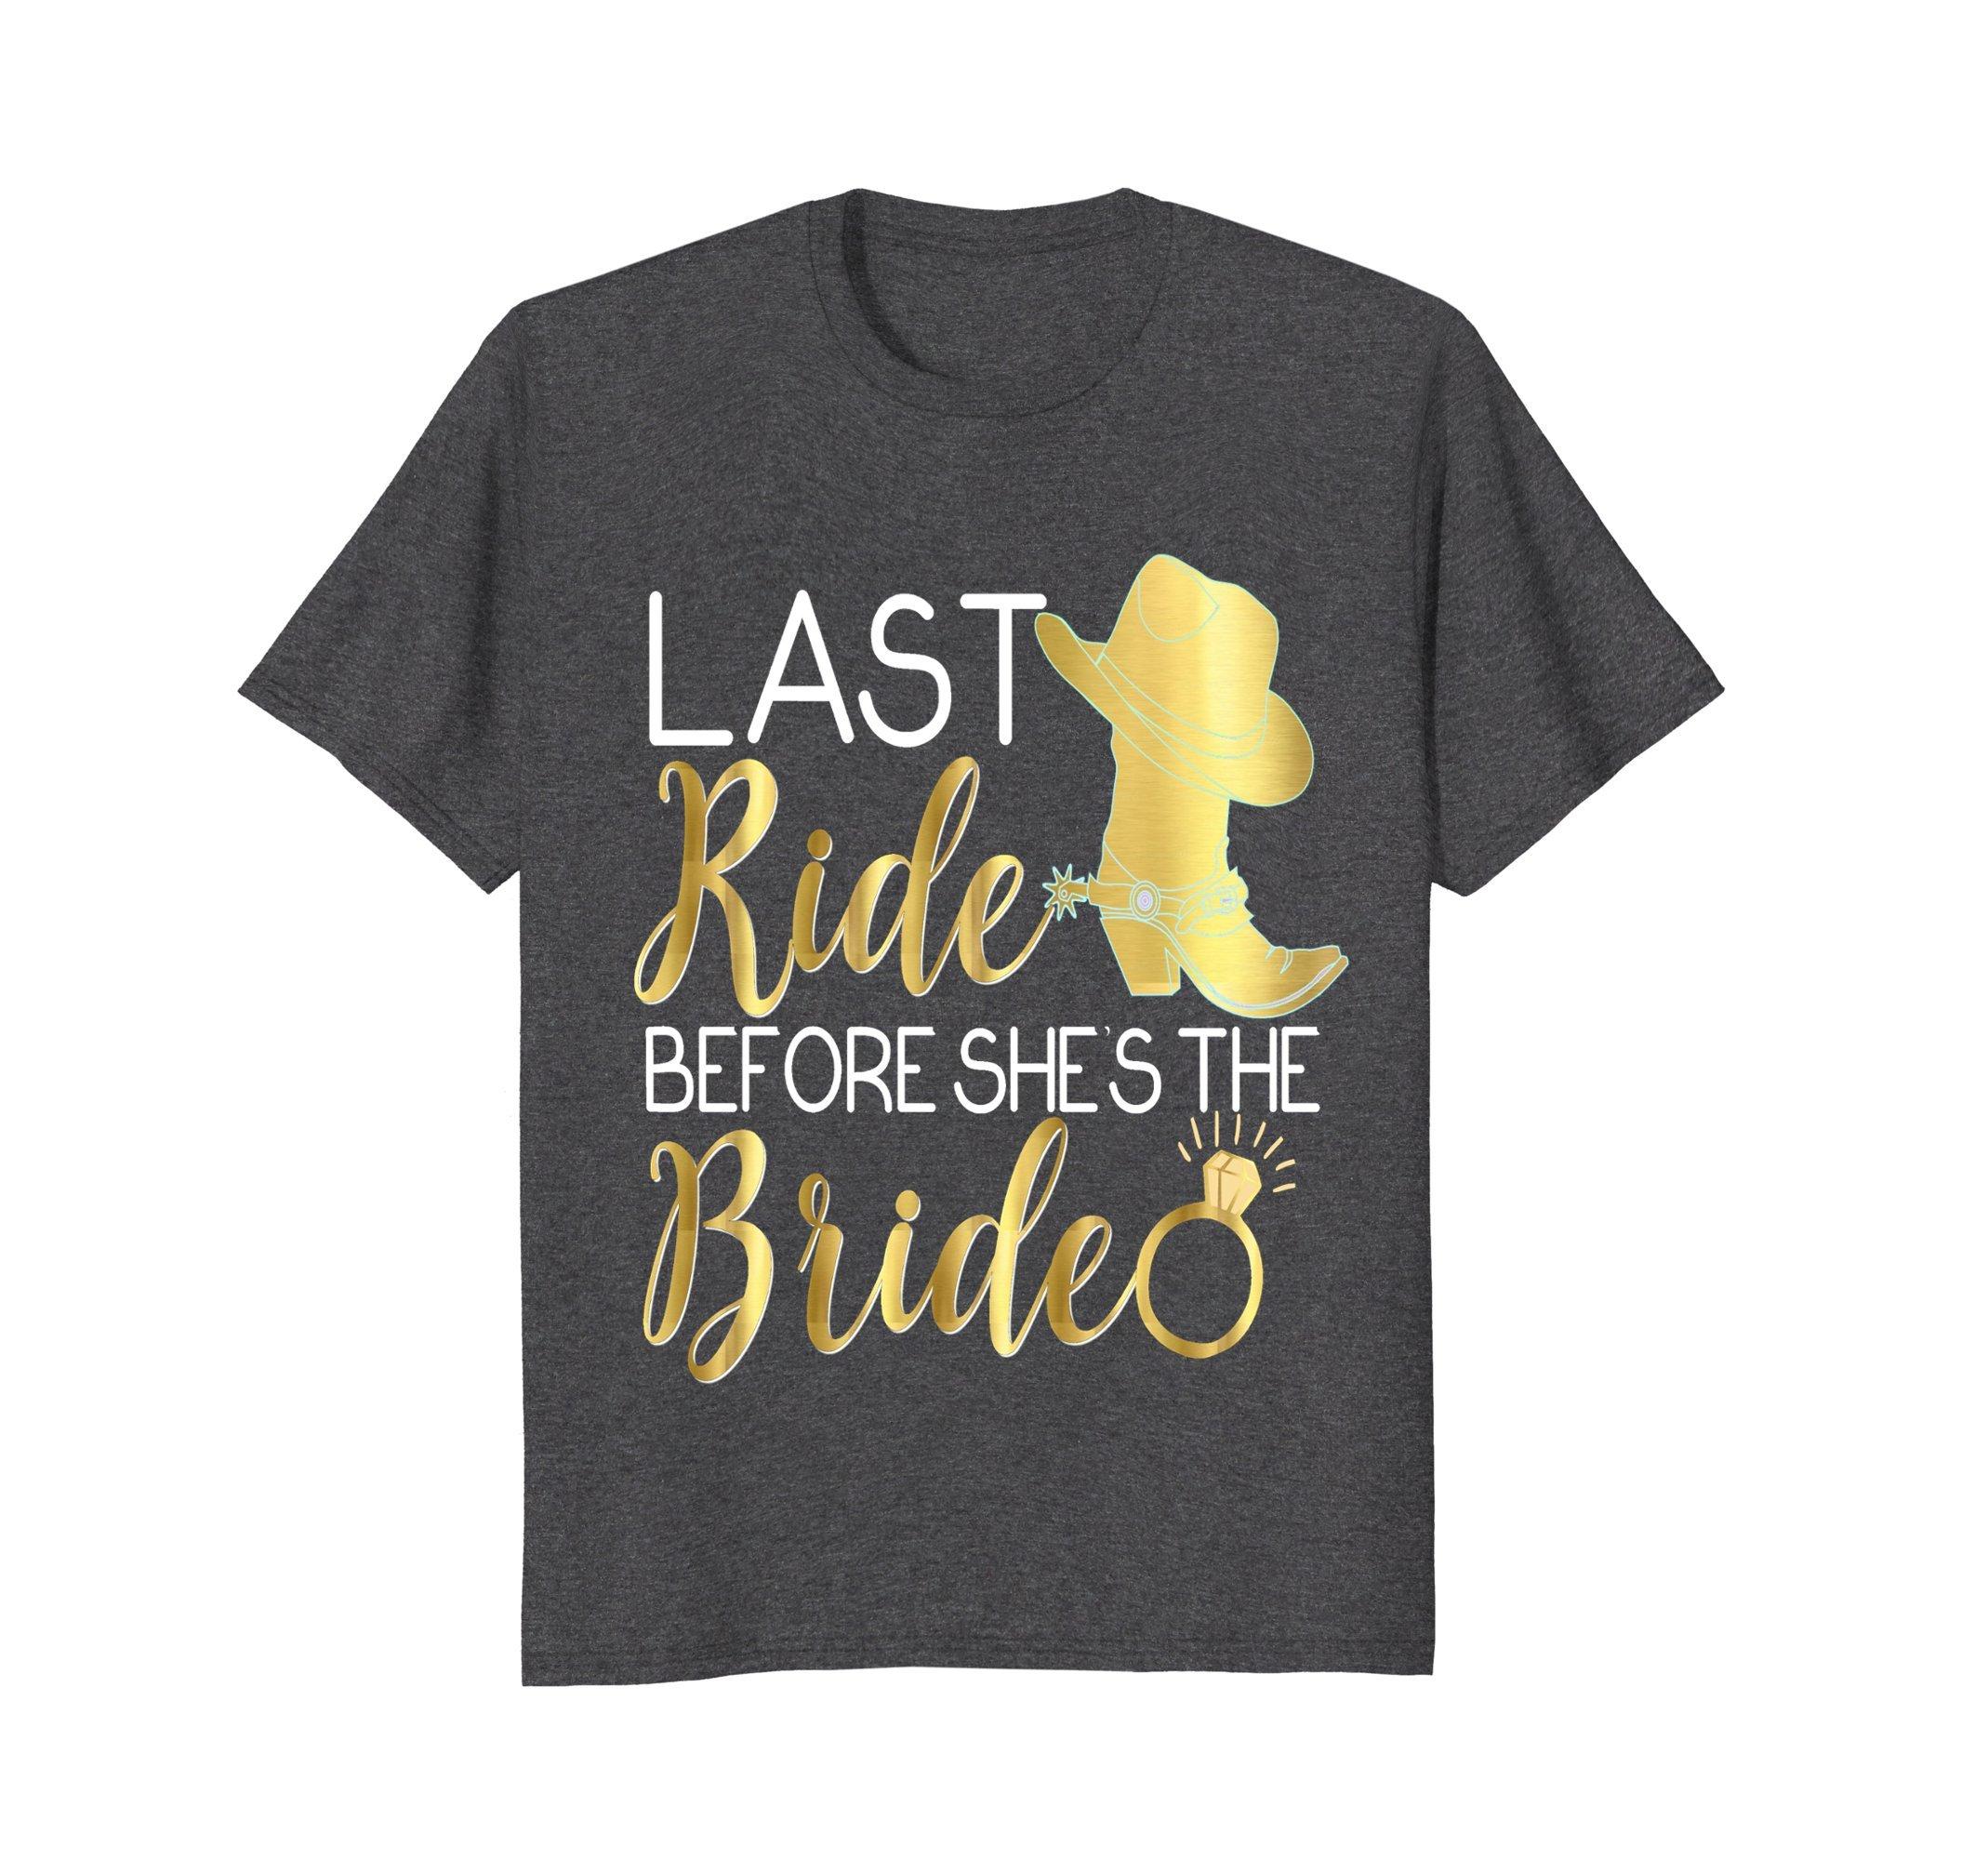 Mens Bridesmaid Shirt Last Ride Before She's Bride Cowboy Boots Large Dark Heather